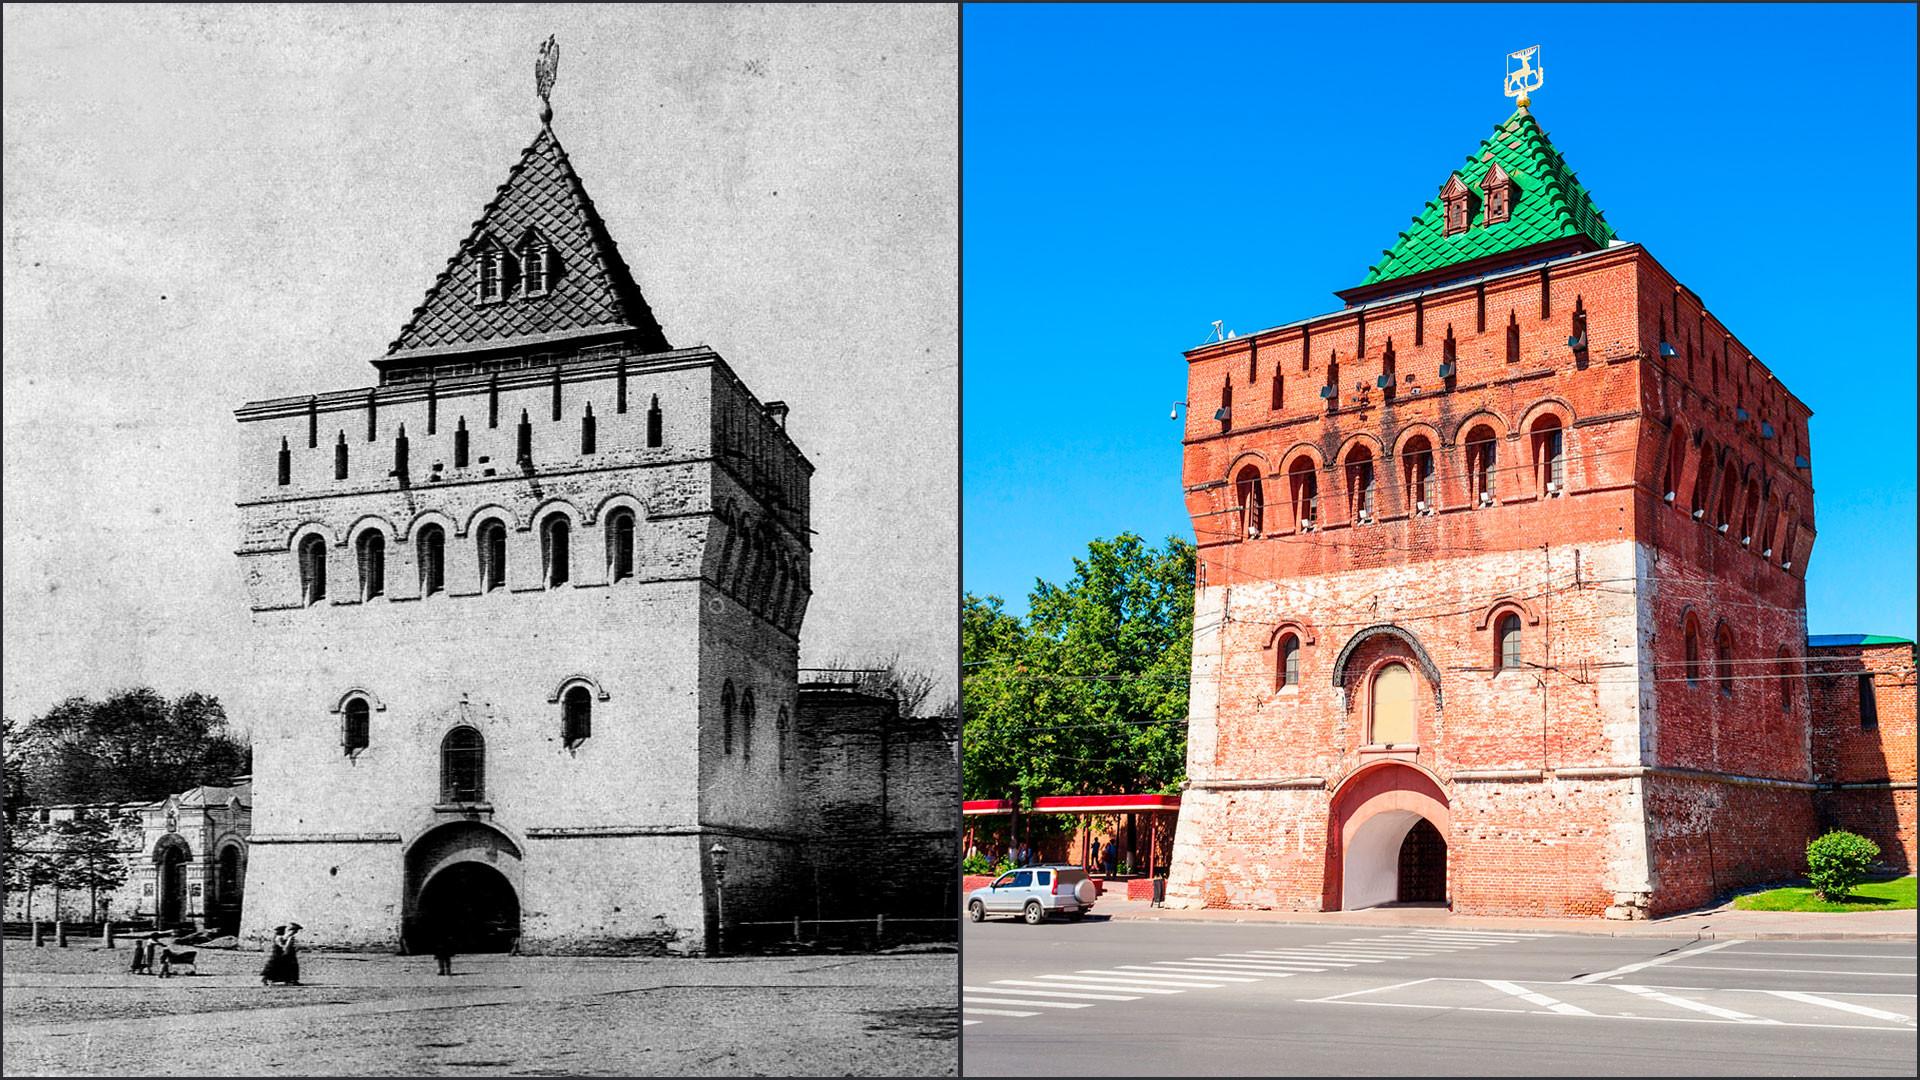 Dmitrievskaya Tower through the centuries.